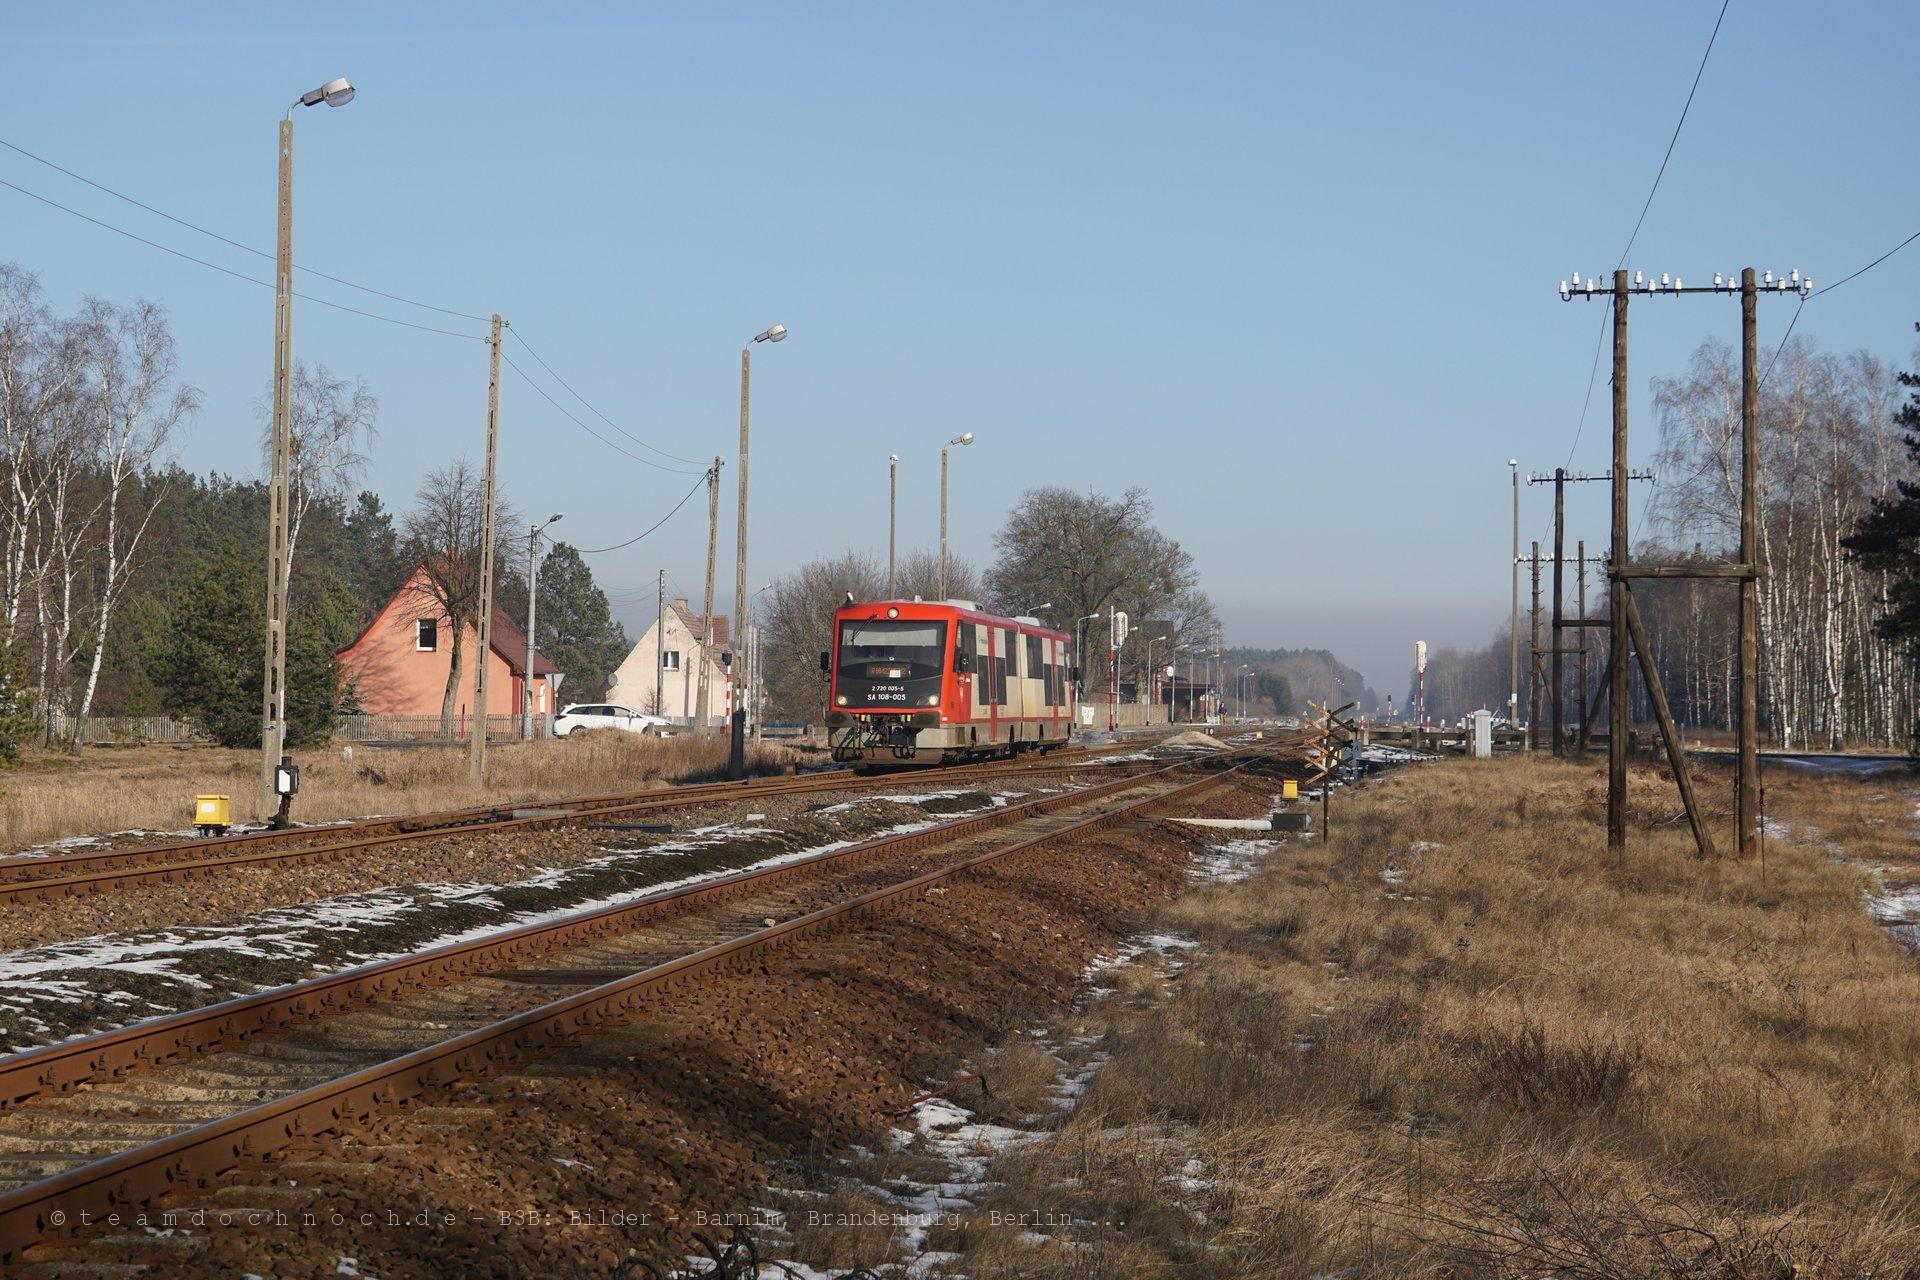 SA108-005 verläßt den Bahnhof Biernatowo an der Ostbahn in Richtung